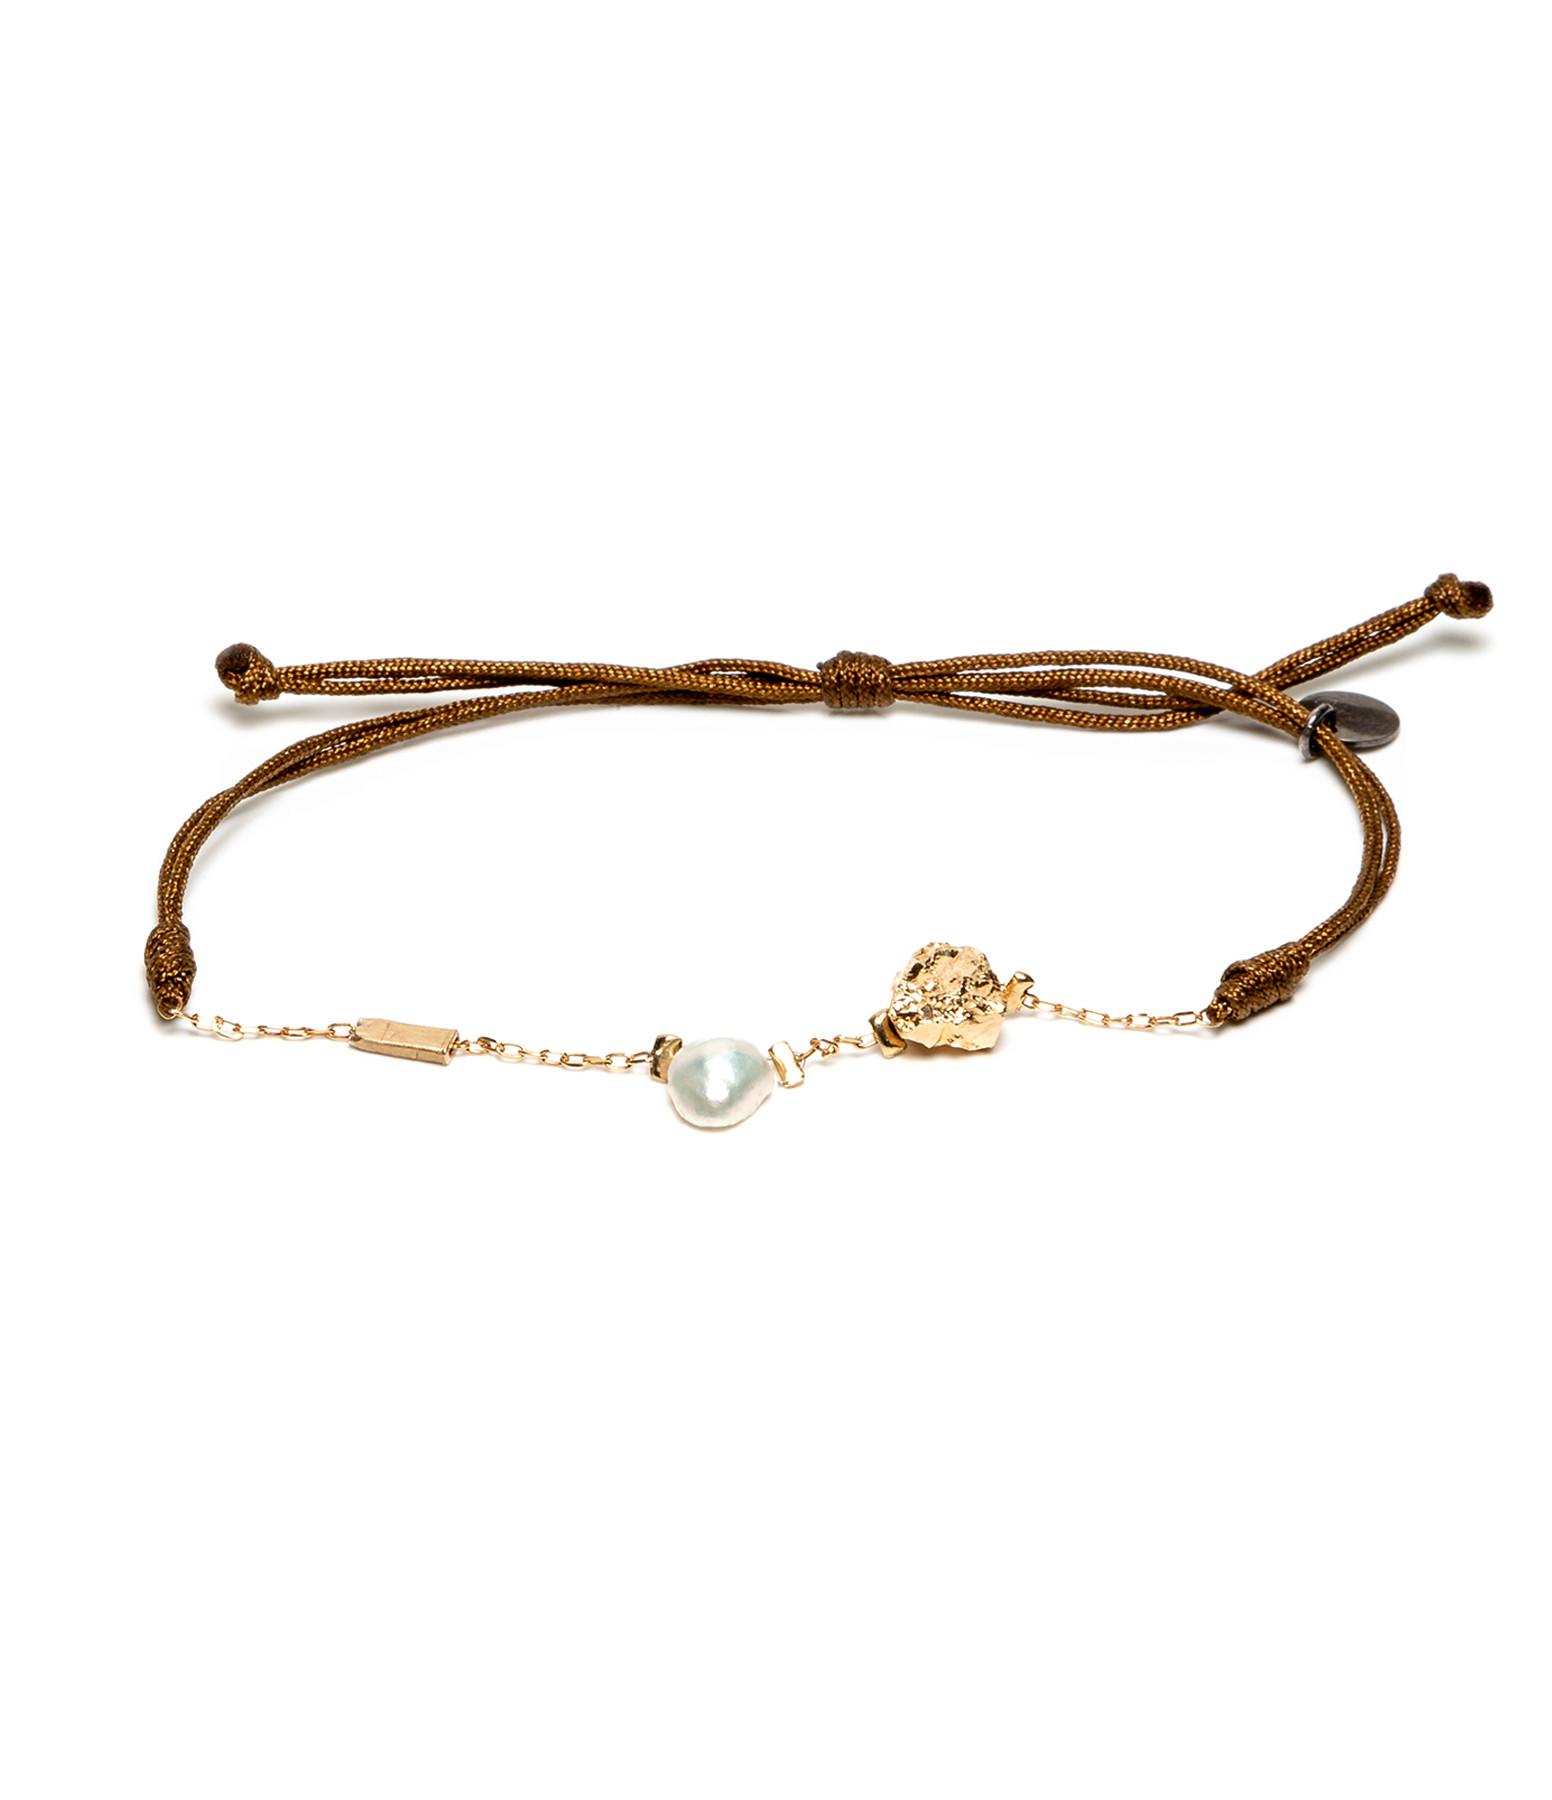 LSONGE - Bracelet Cordon Perle Blanche AGD